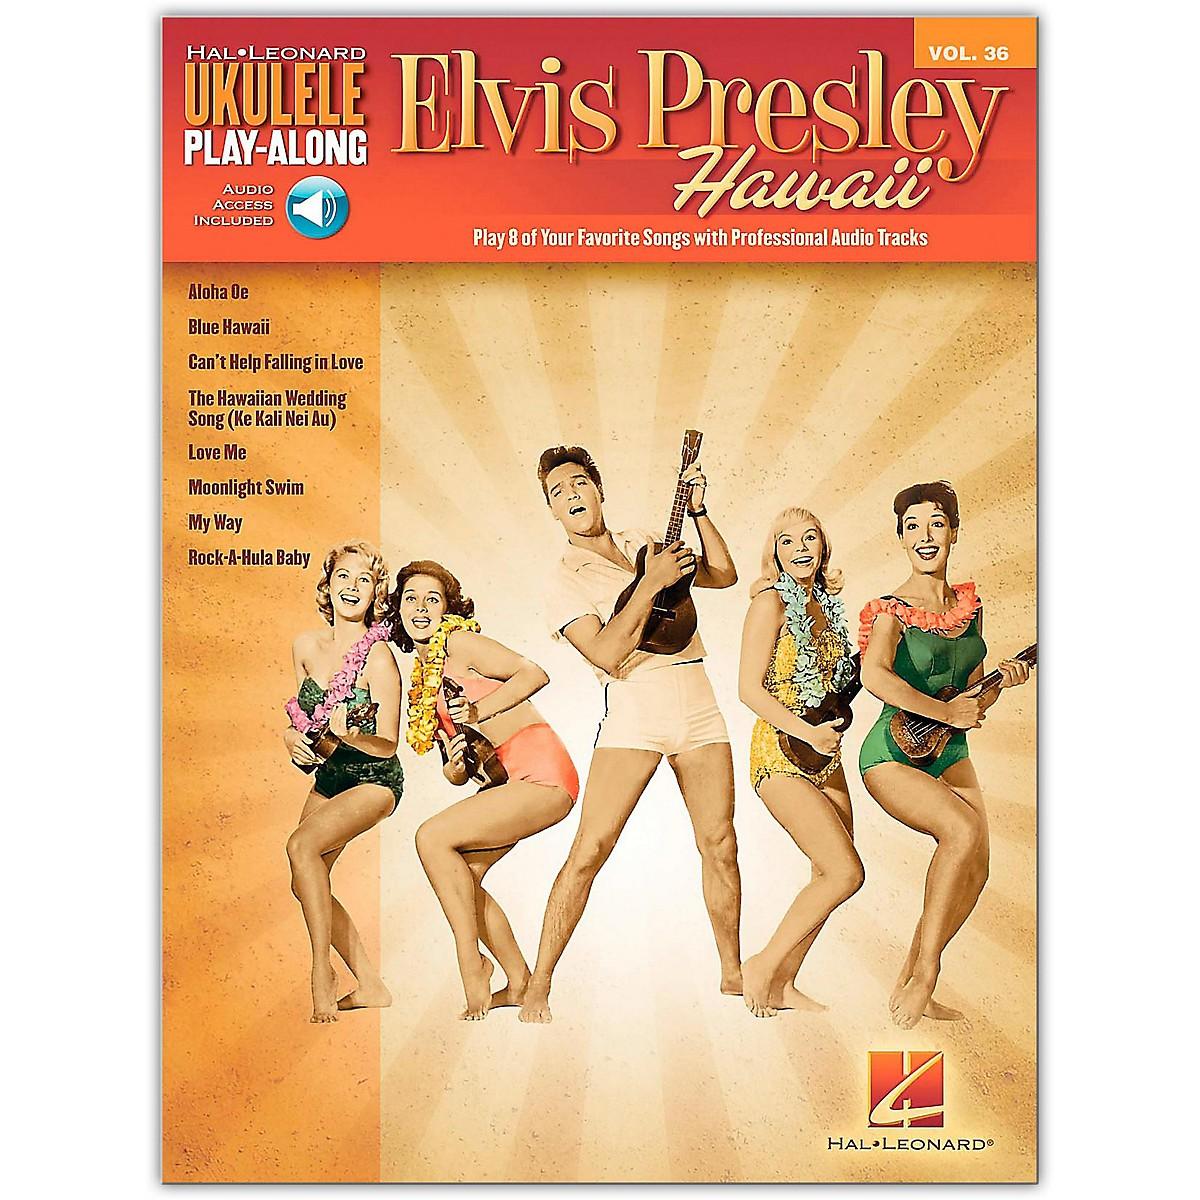 Hal Leonard Elvis Presley Hawaii - Ukulele Play-Along Vol. 36 Book/Online Audio